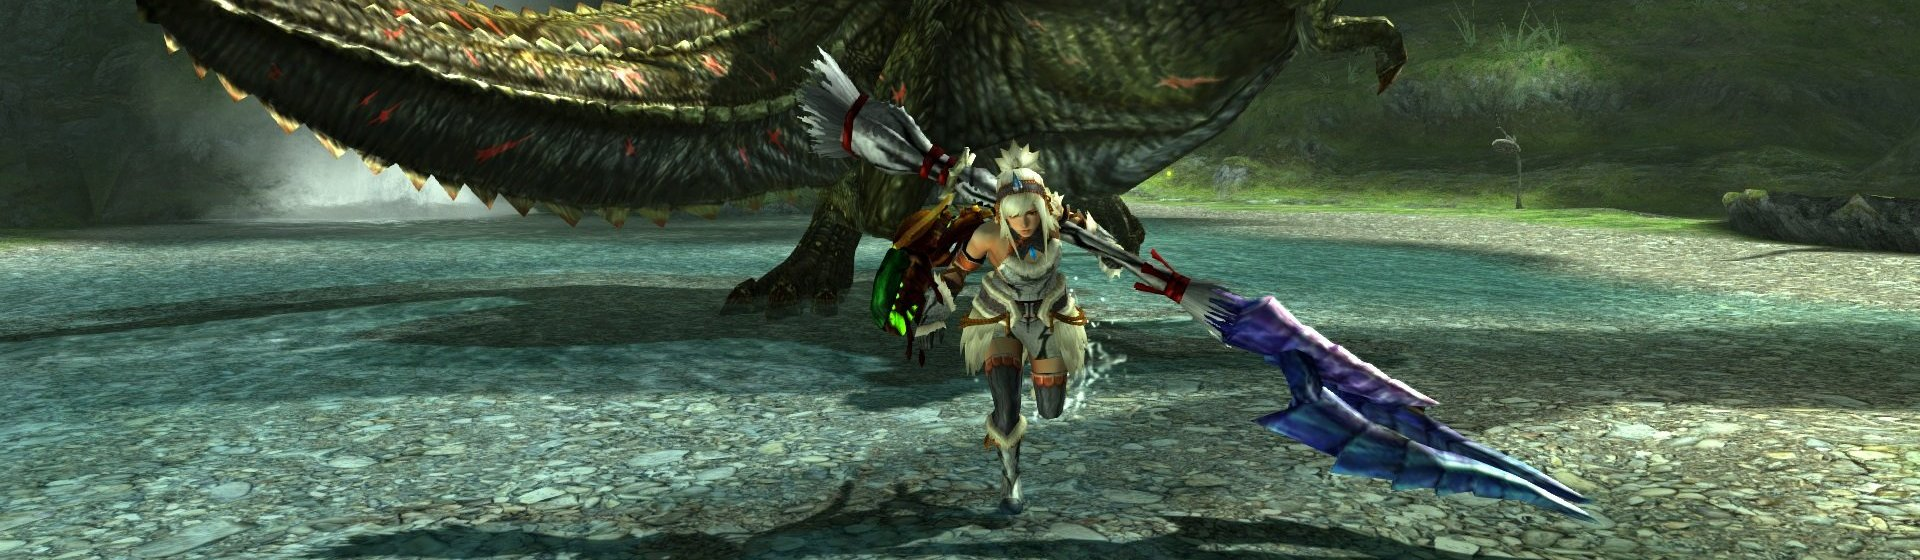 Shintaro Kojima - người sản xuất Monster Hunter Generations, rời Capcom